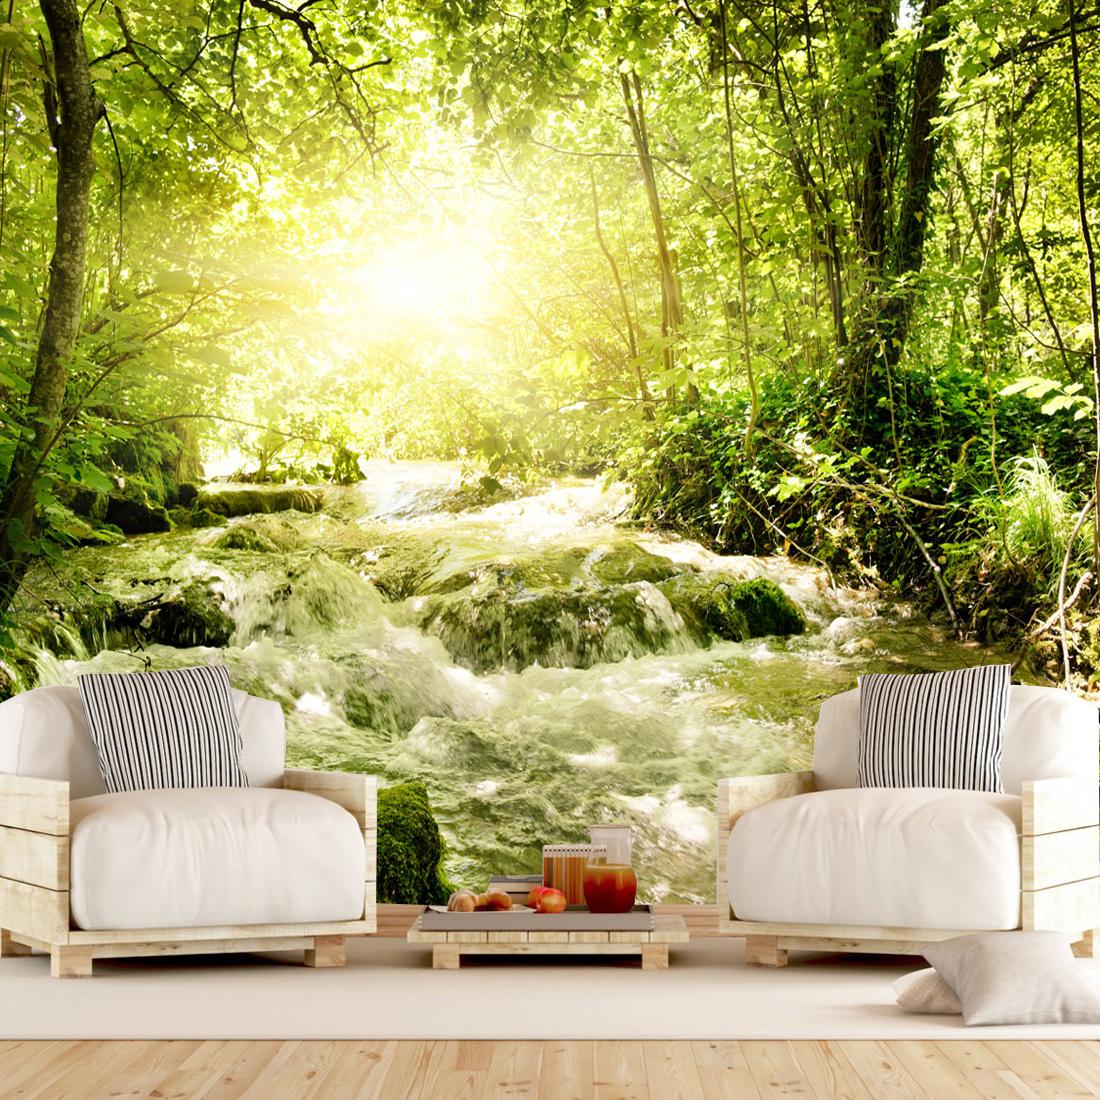 پوستر دیواری سه بعدی طرح جنگل کد 01134